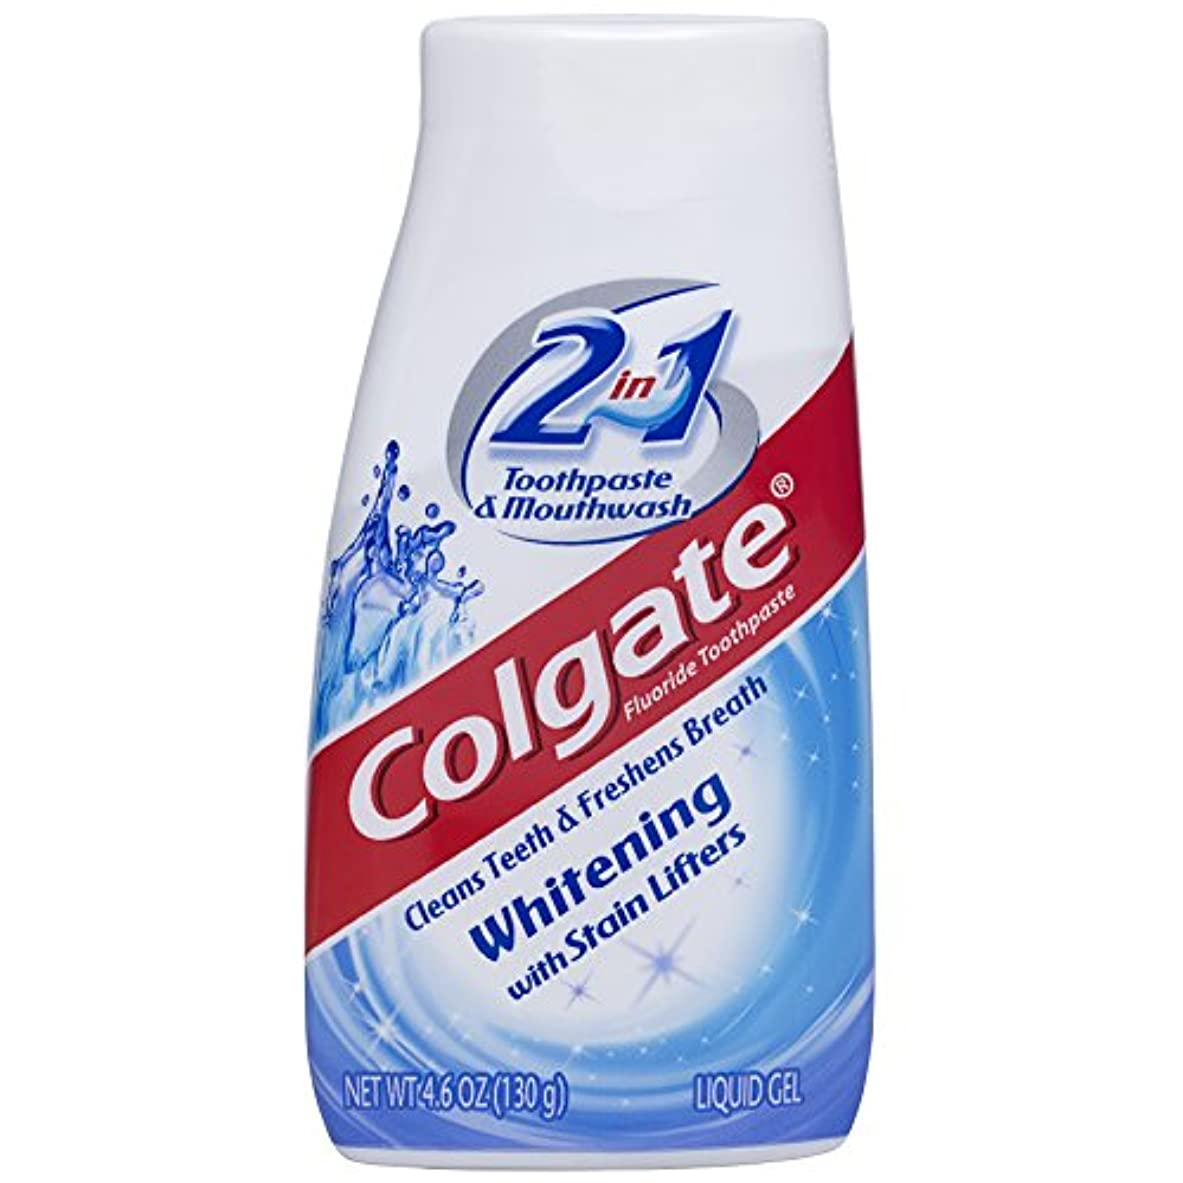 スワップ過激派一部海外直送品Colgate 2 In 1 Toothpaste & Mouthwash Whitening, 4.6 oz by Colgate